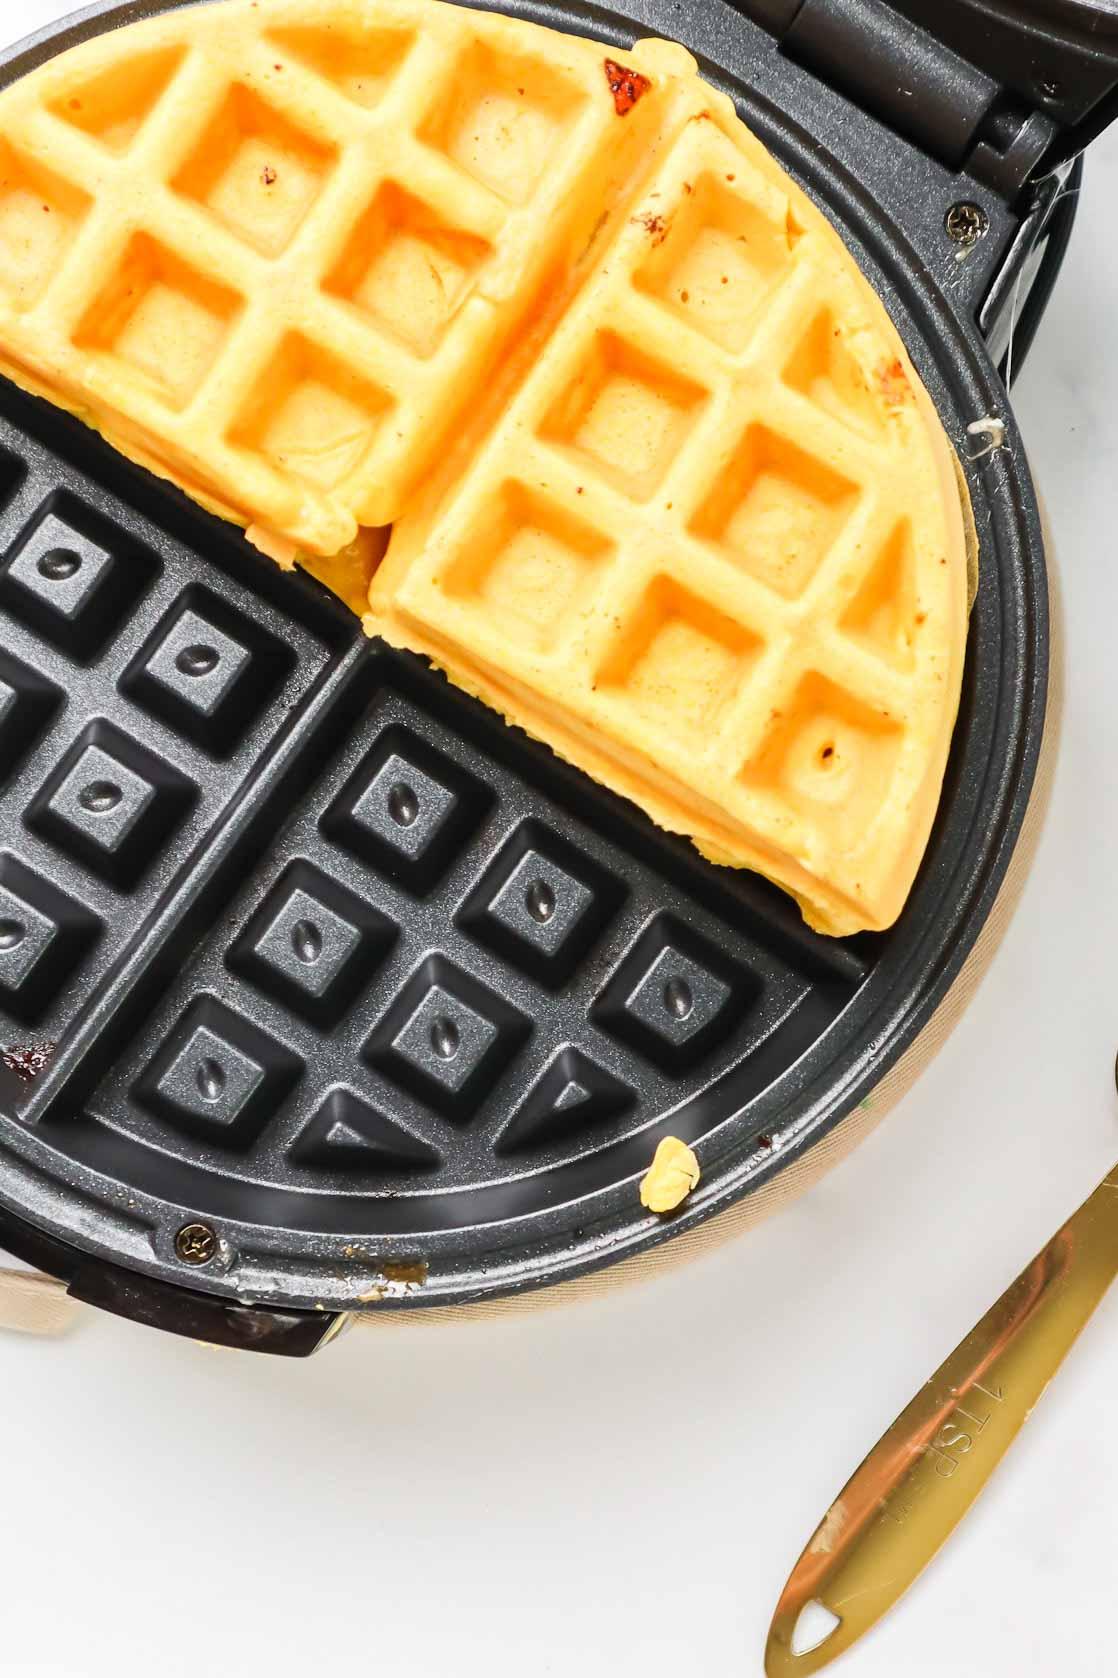 Half a waffle in a waffle iron.